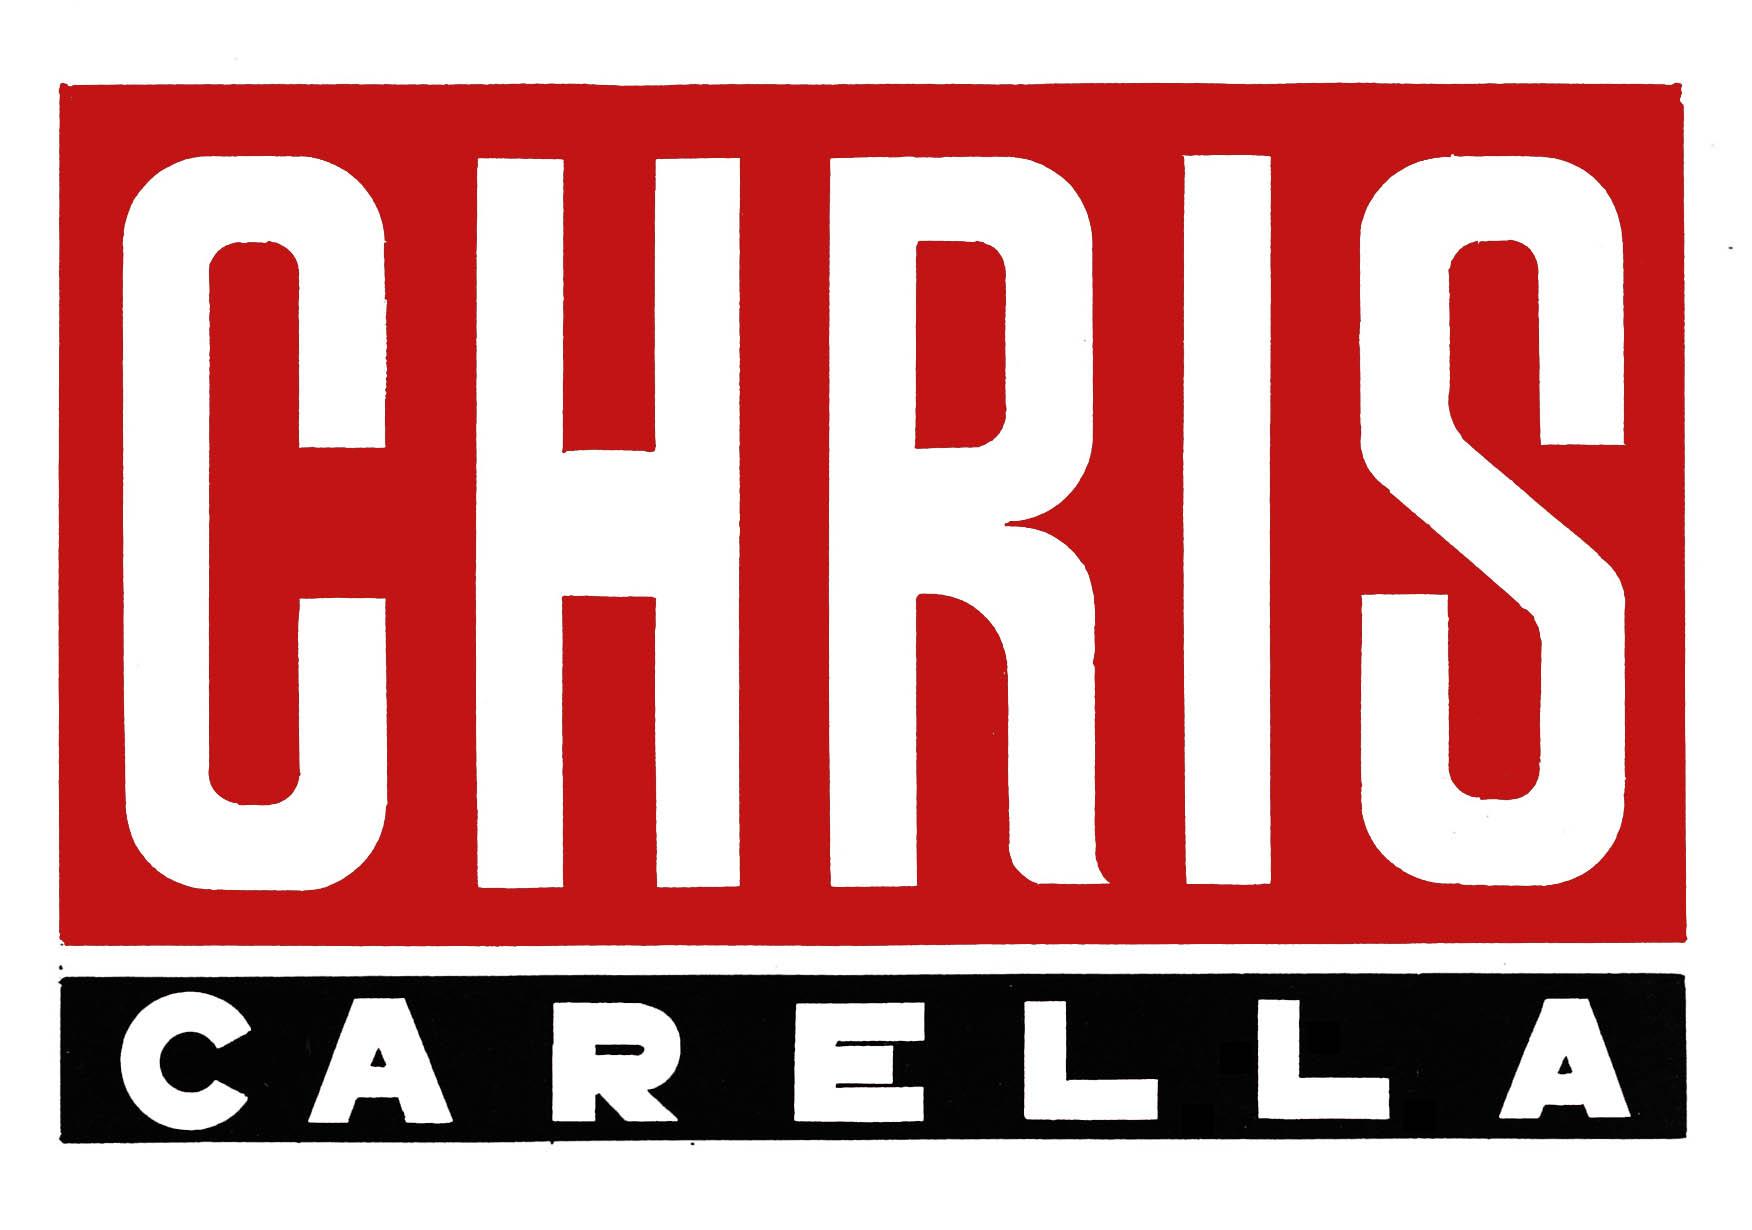 Chris Carella Artist Wanted